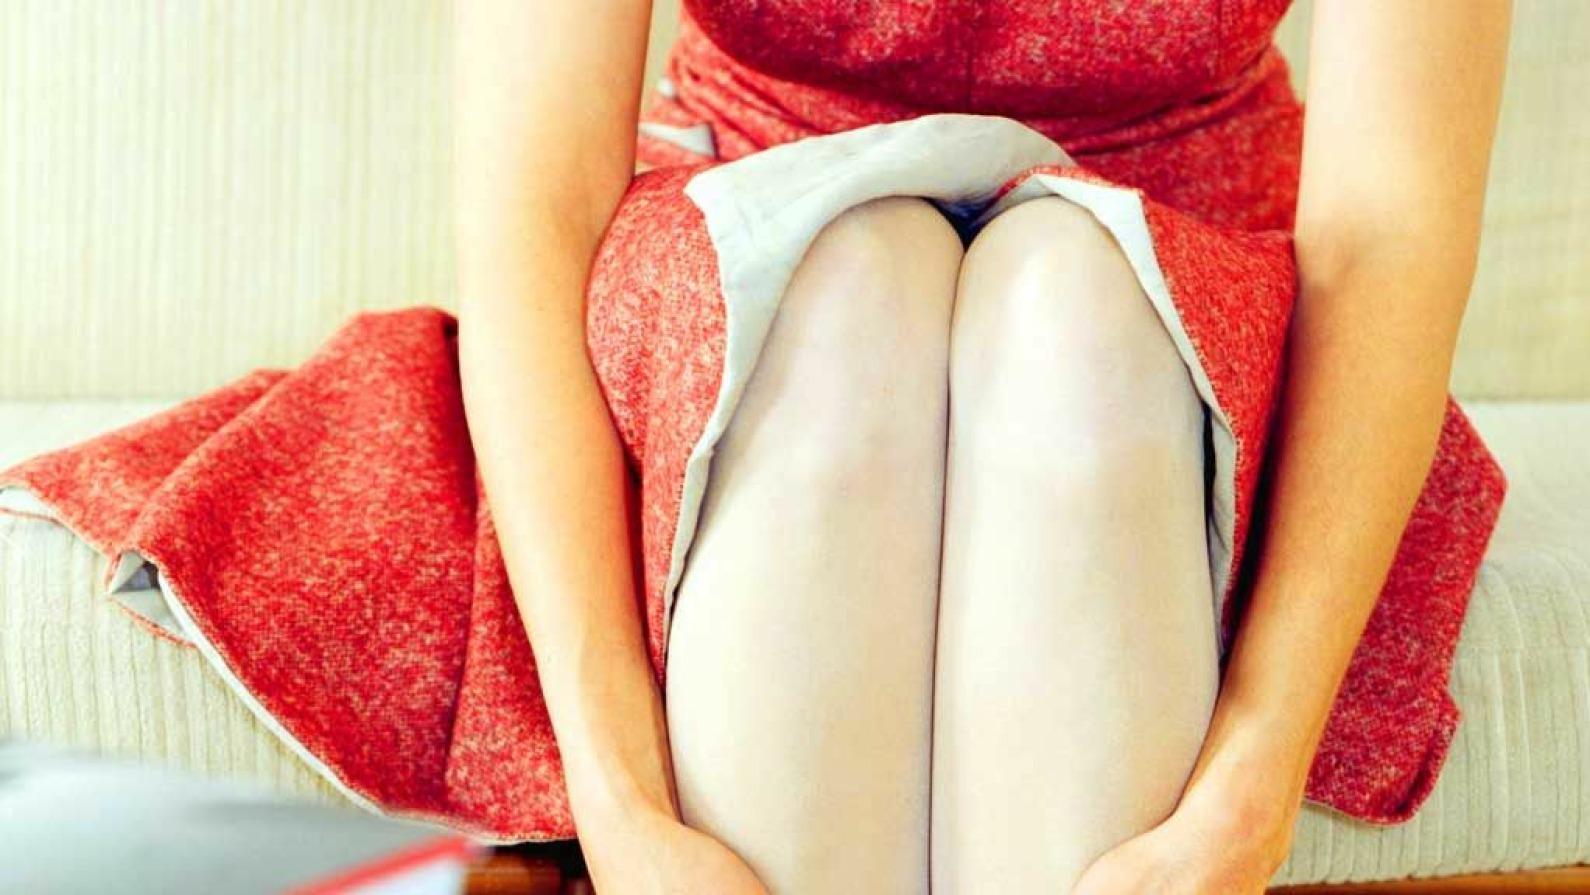 Er smerter i underlivet farlig?